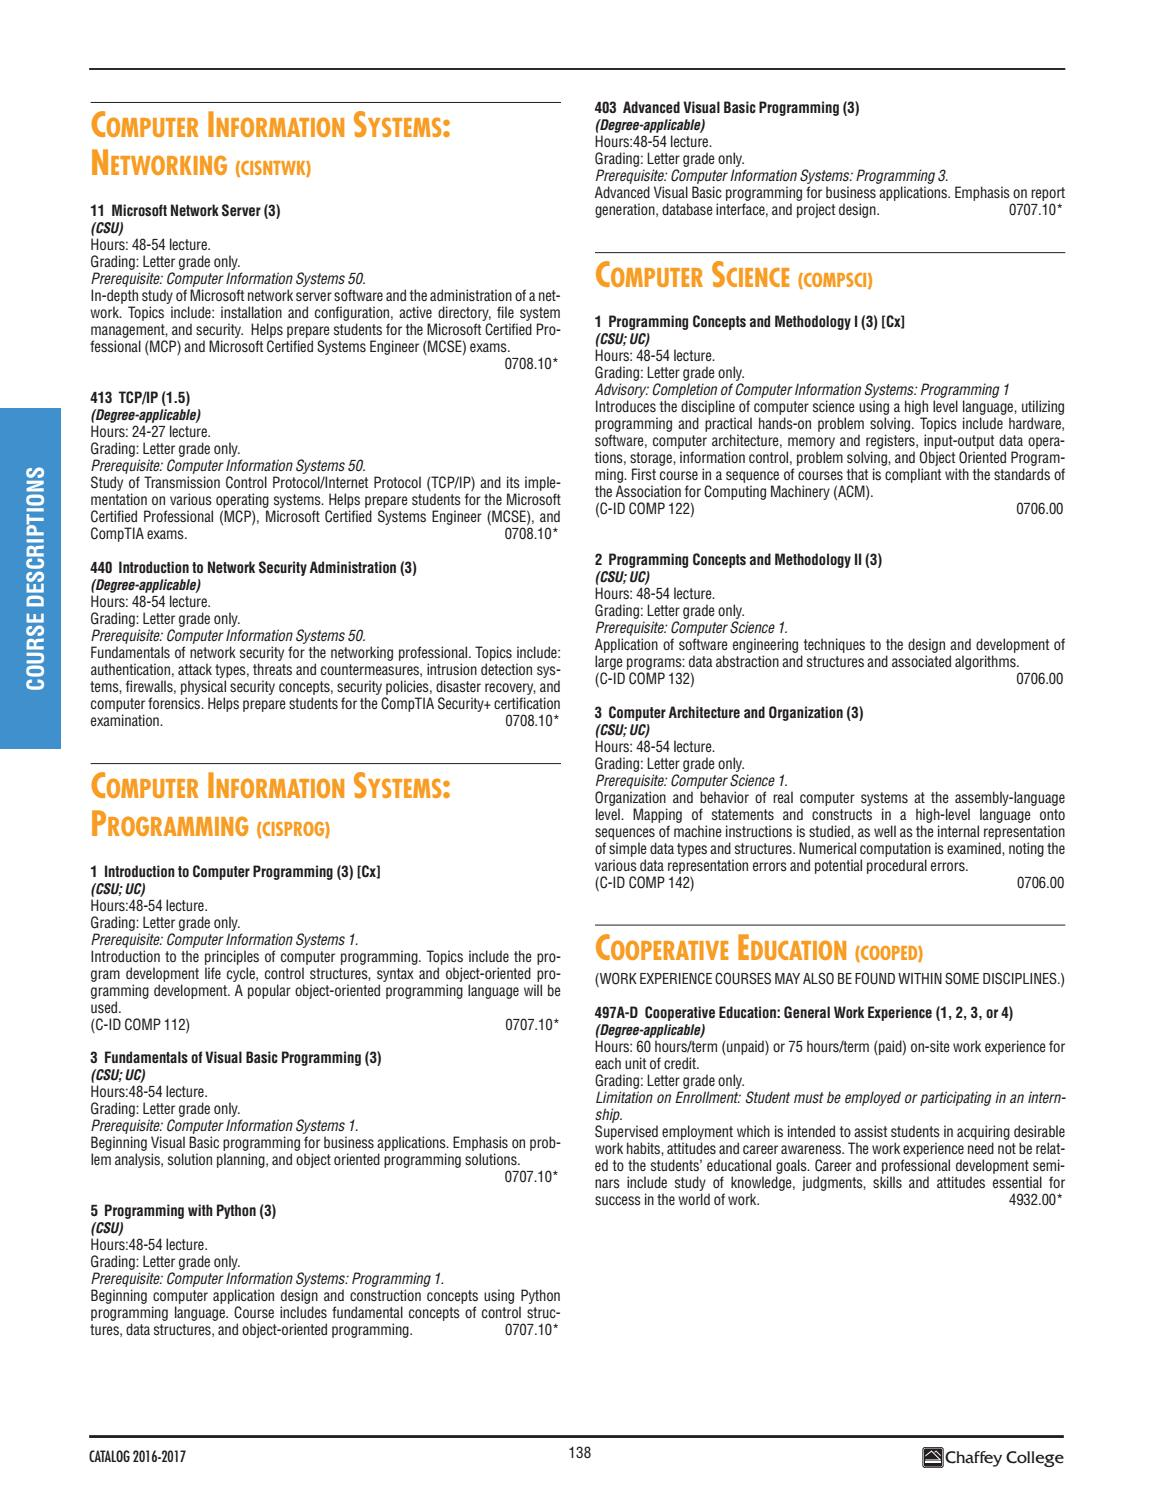 Chaffey College Catalog 2016 2017 By Chaffey College Issuu